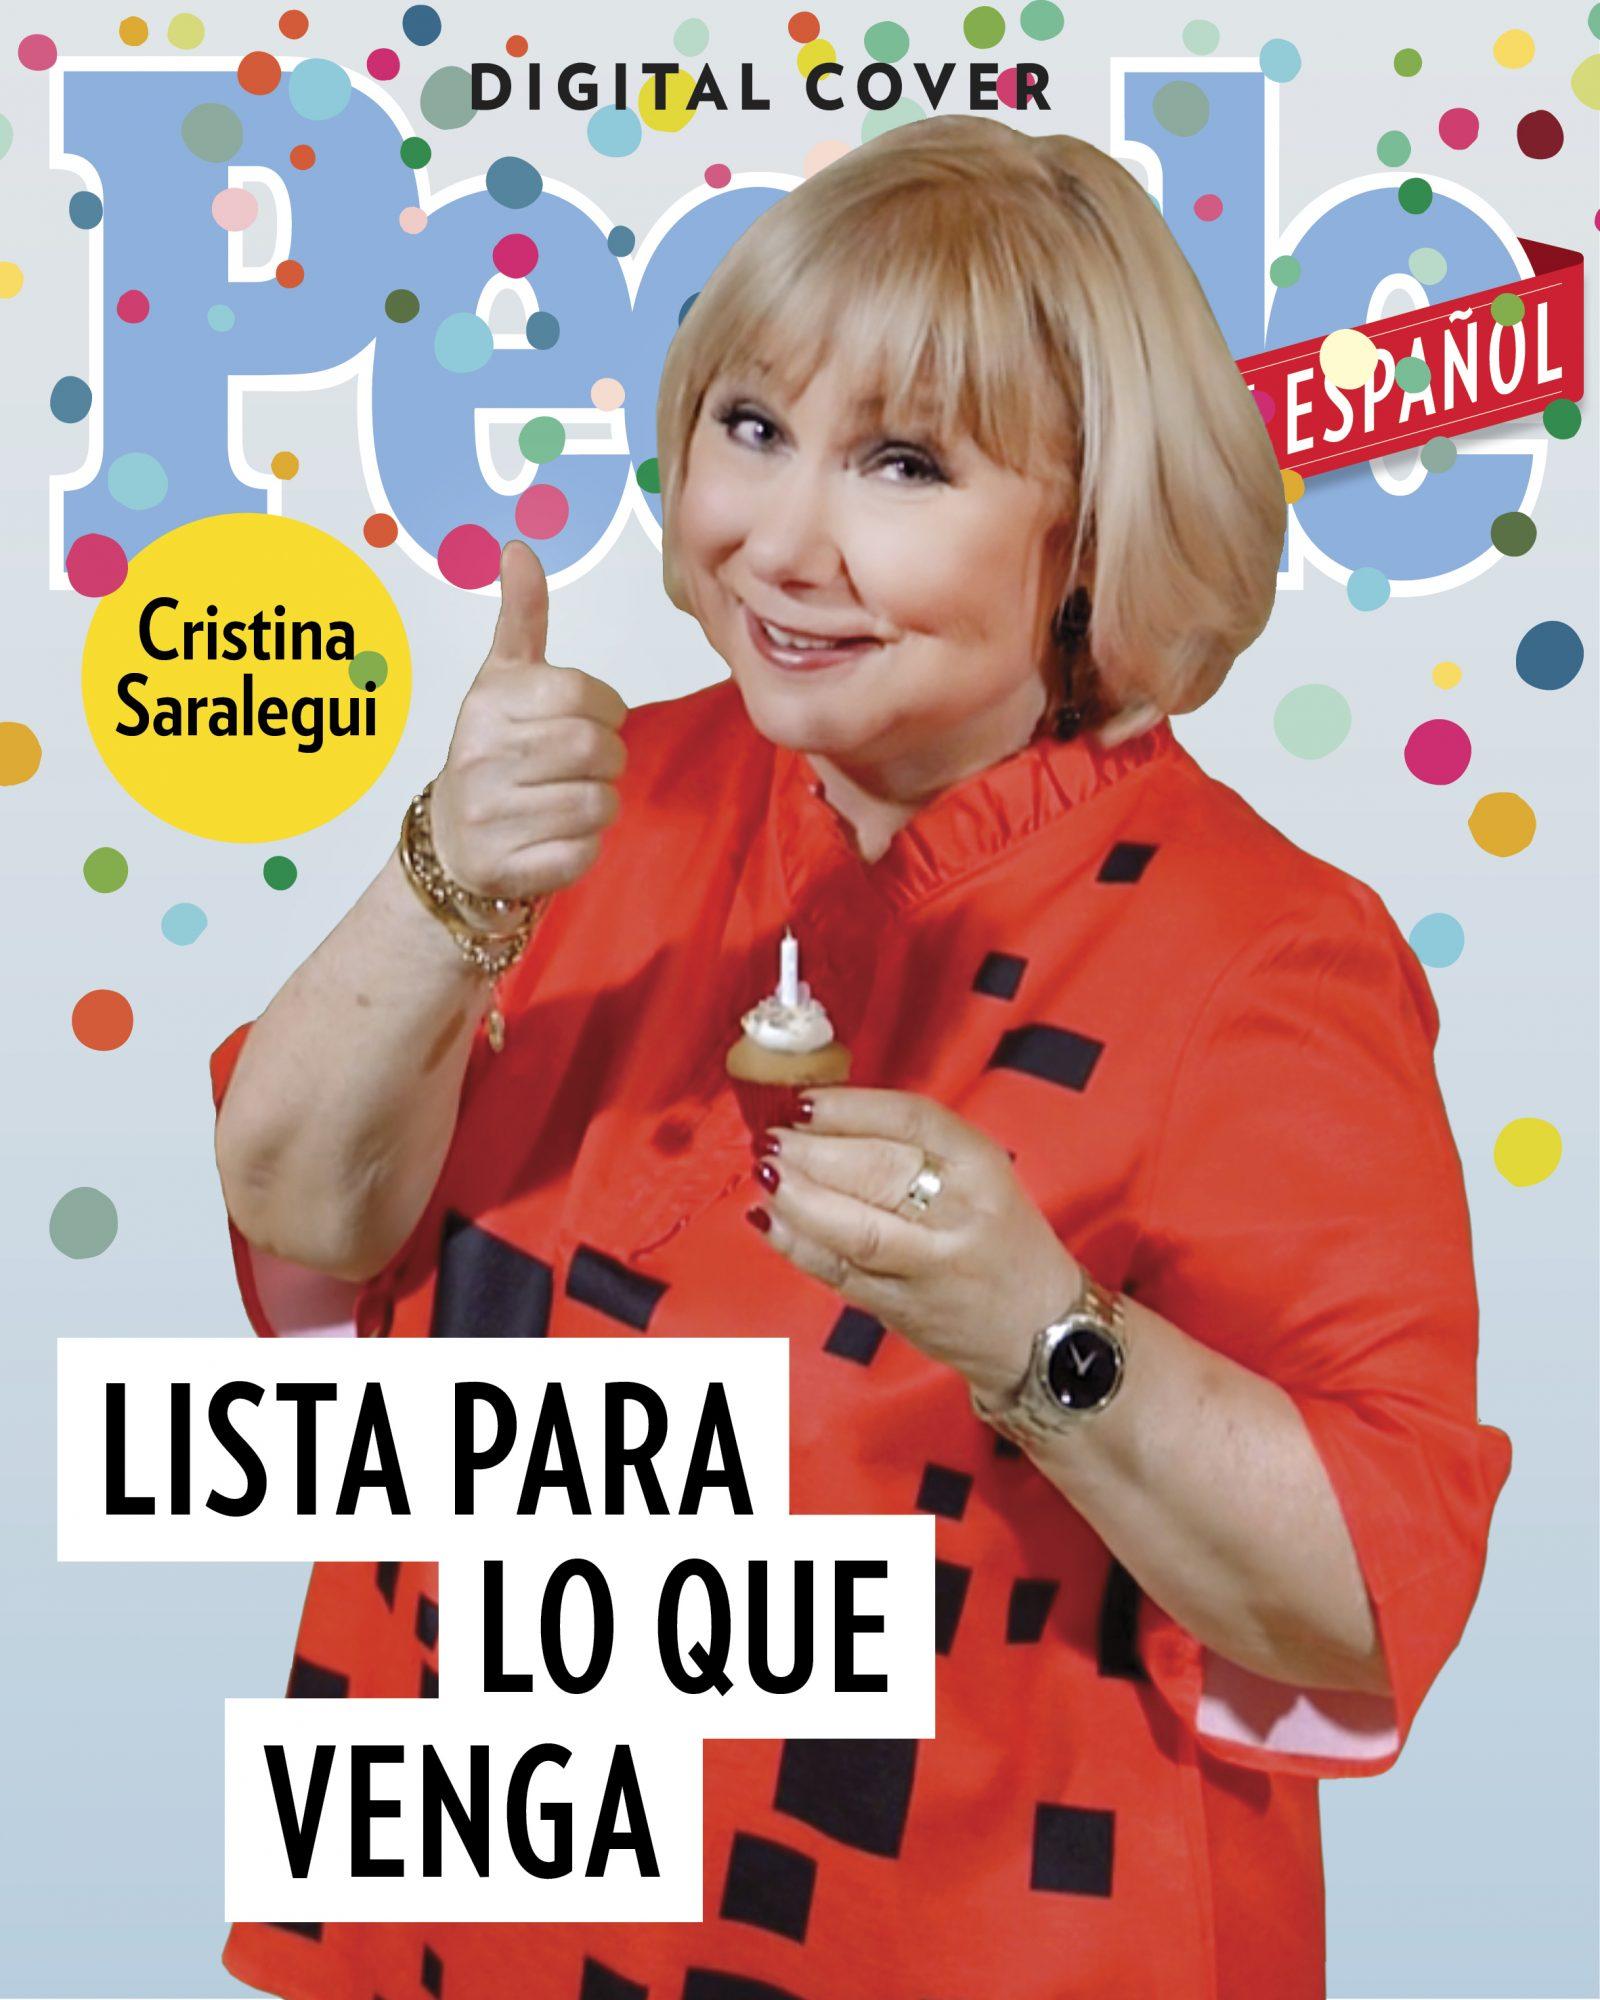 Cristina Saralegui Digital Cover